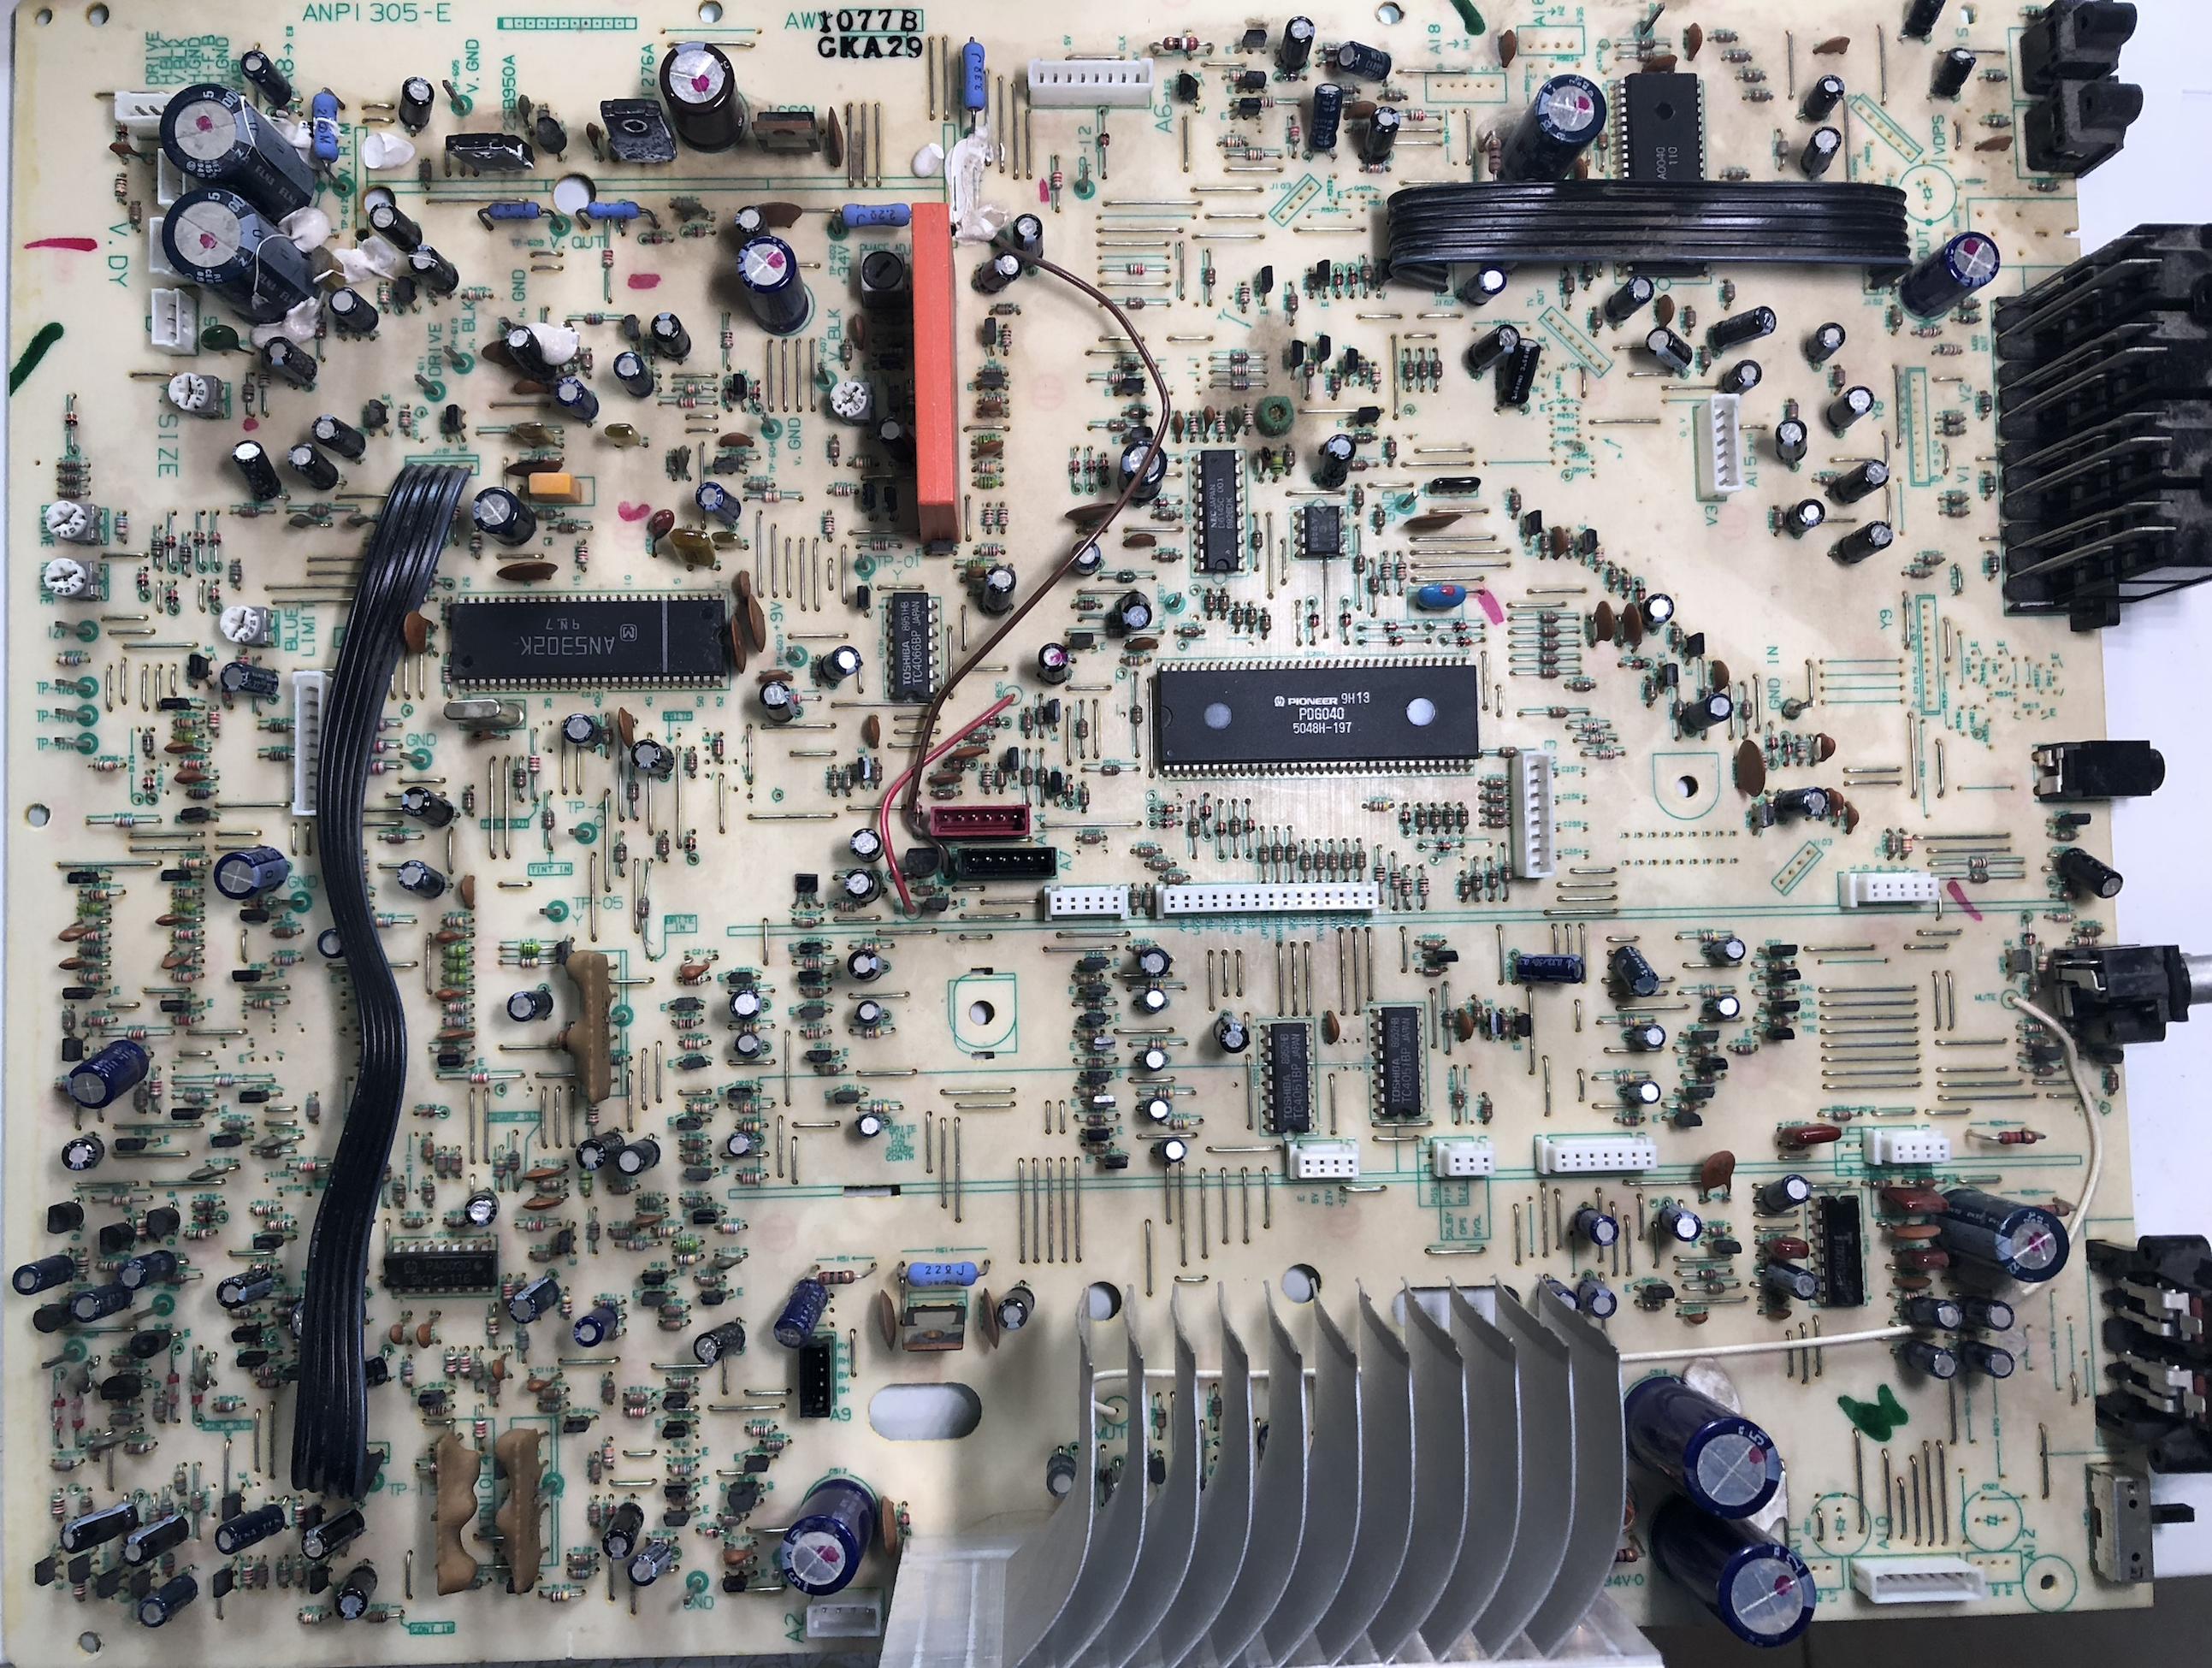 ANPI305-E component side